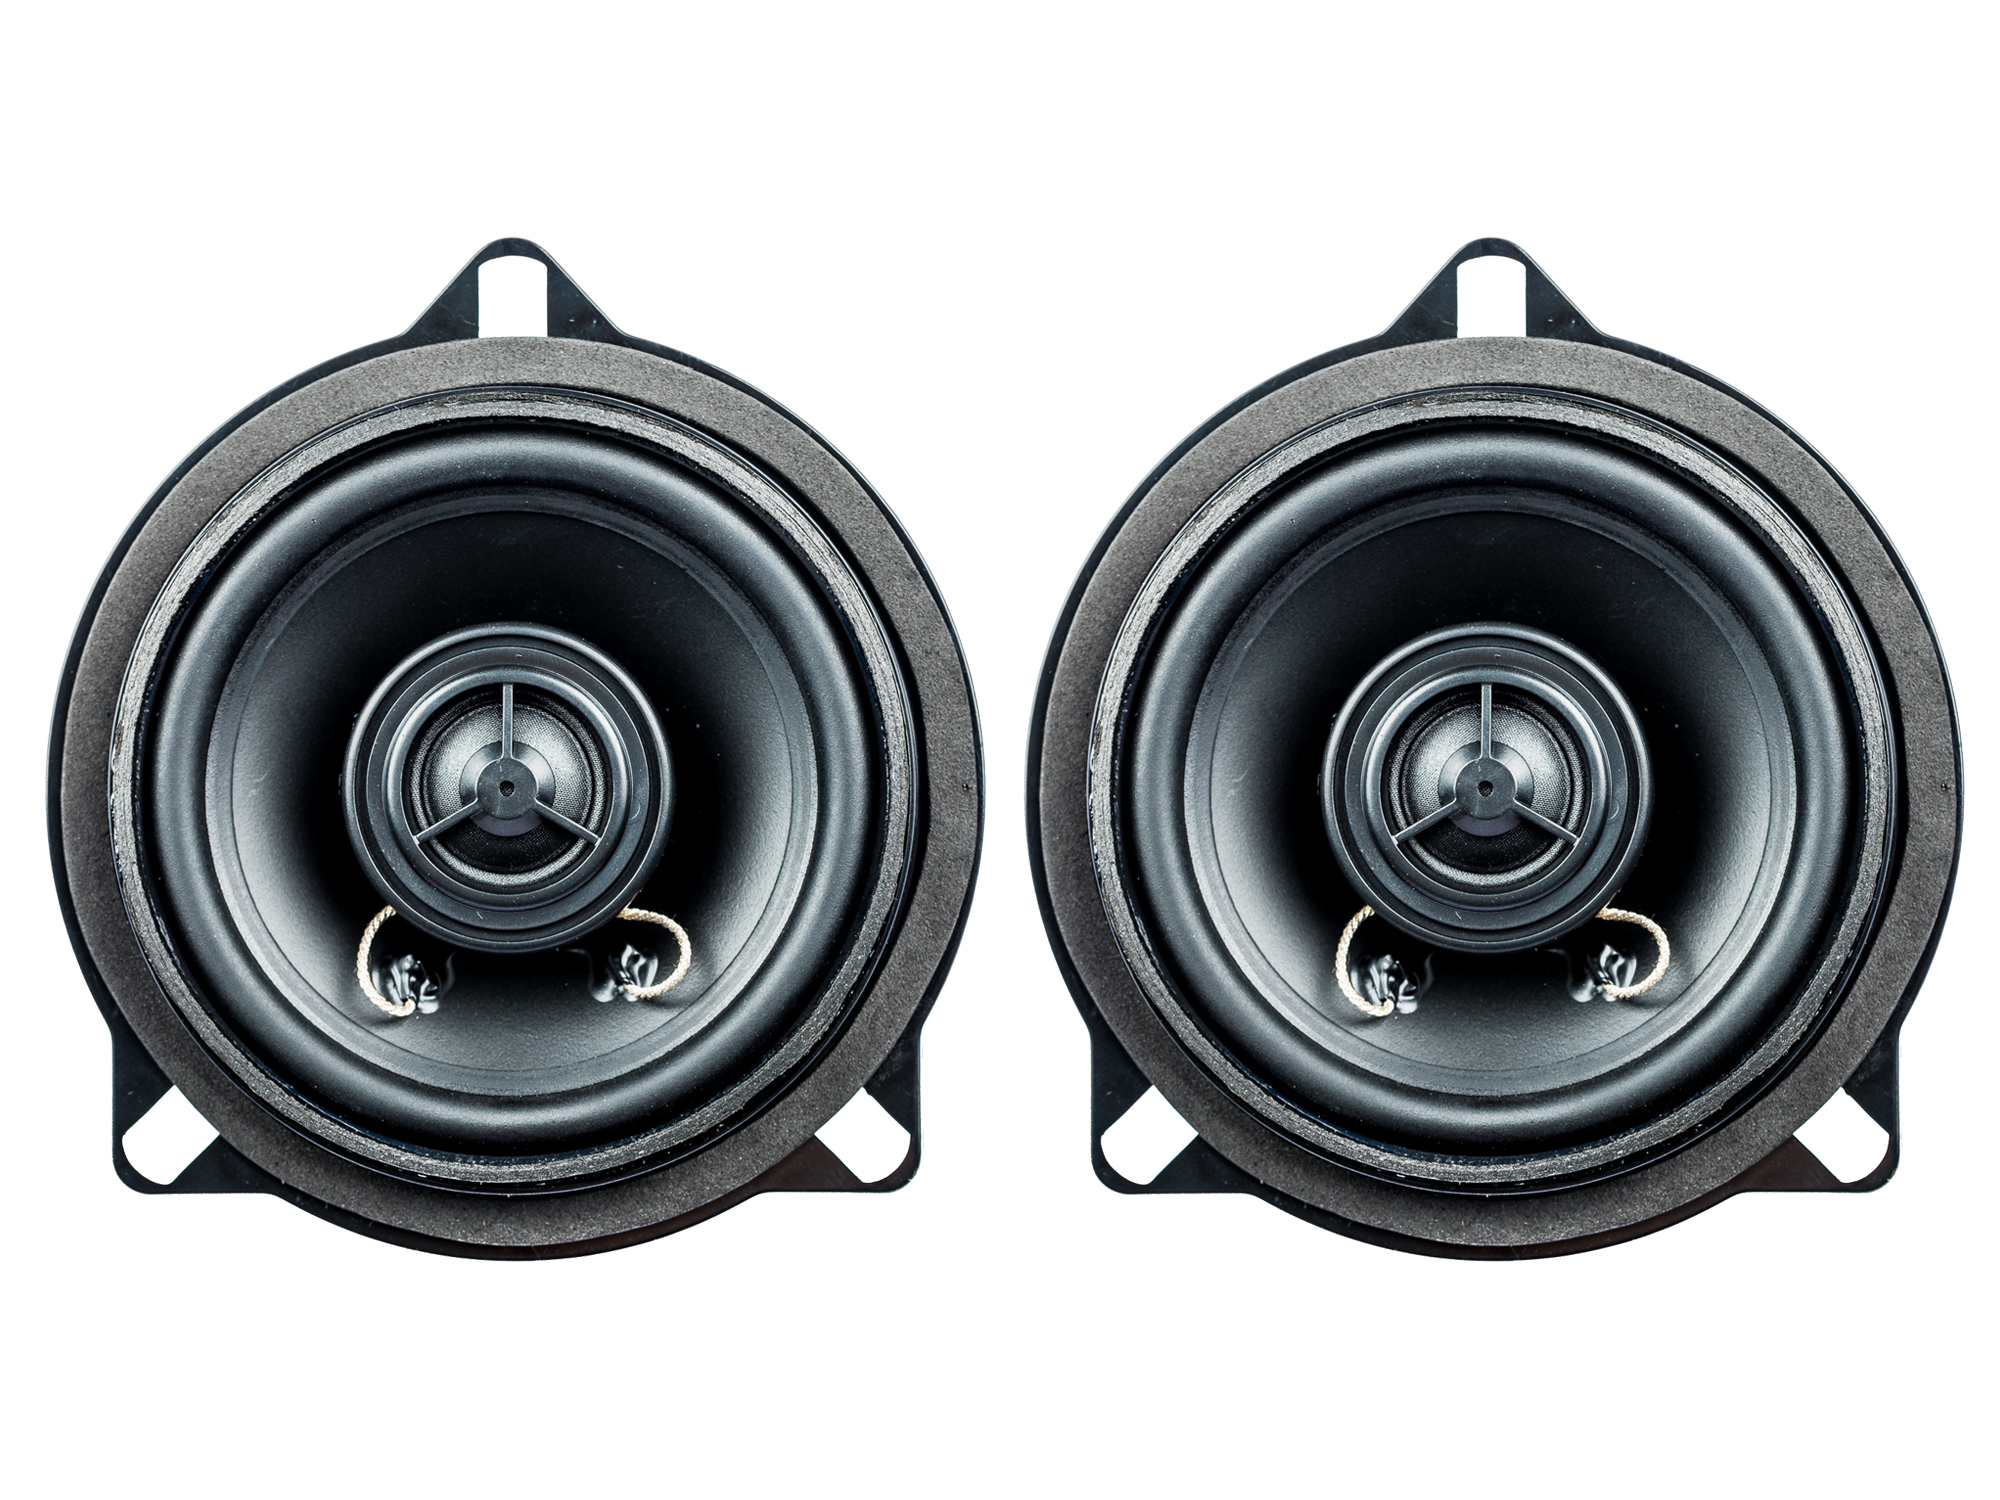 PG Audio BM-4, 10 cm Koaxial Lautsprecher passend für BMW 1er (E81, E82, E87, E88), 3er (E90, E91, E92) 5er (E60, E61), X1 (E84)1 Paar 001